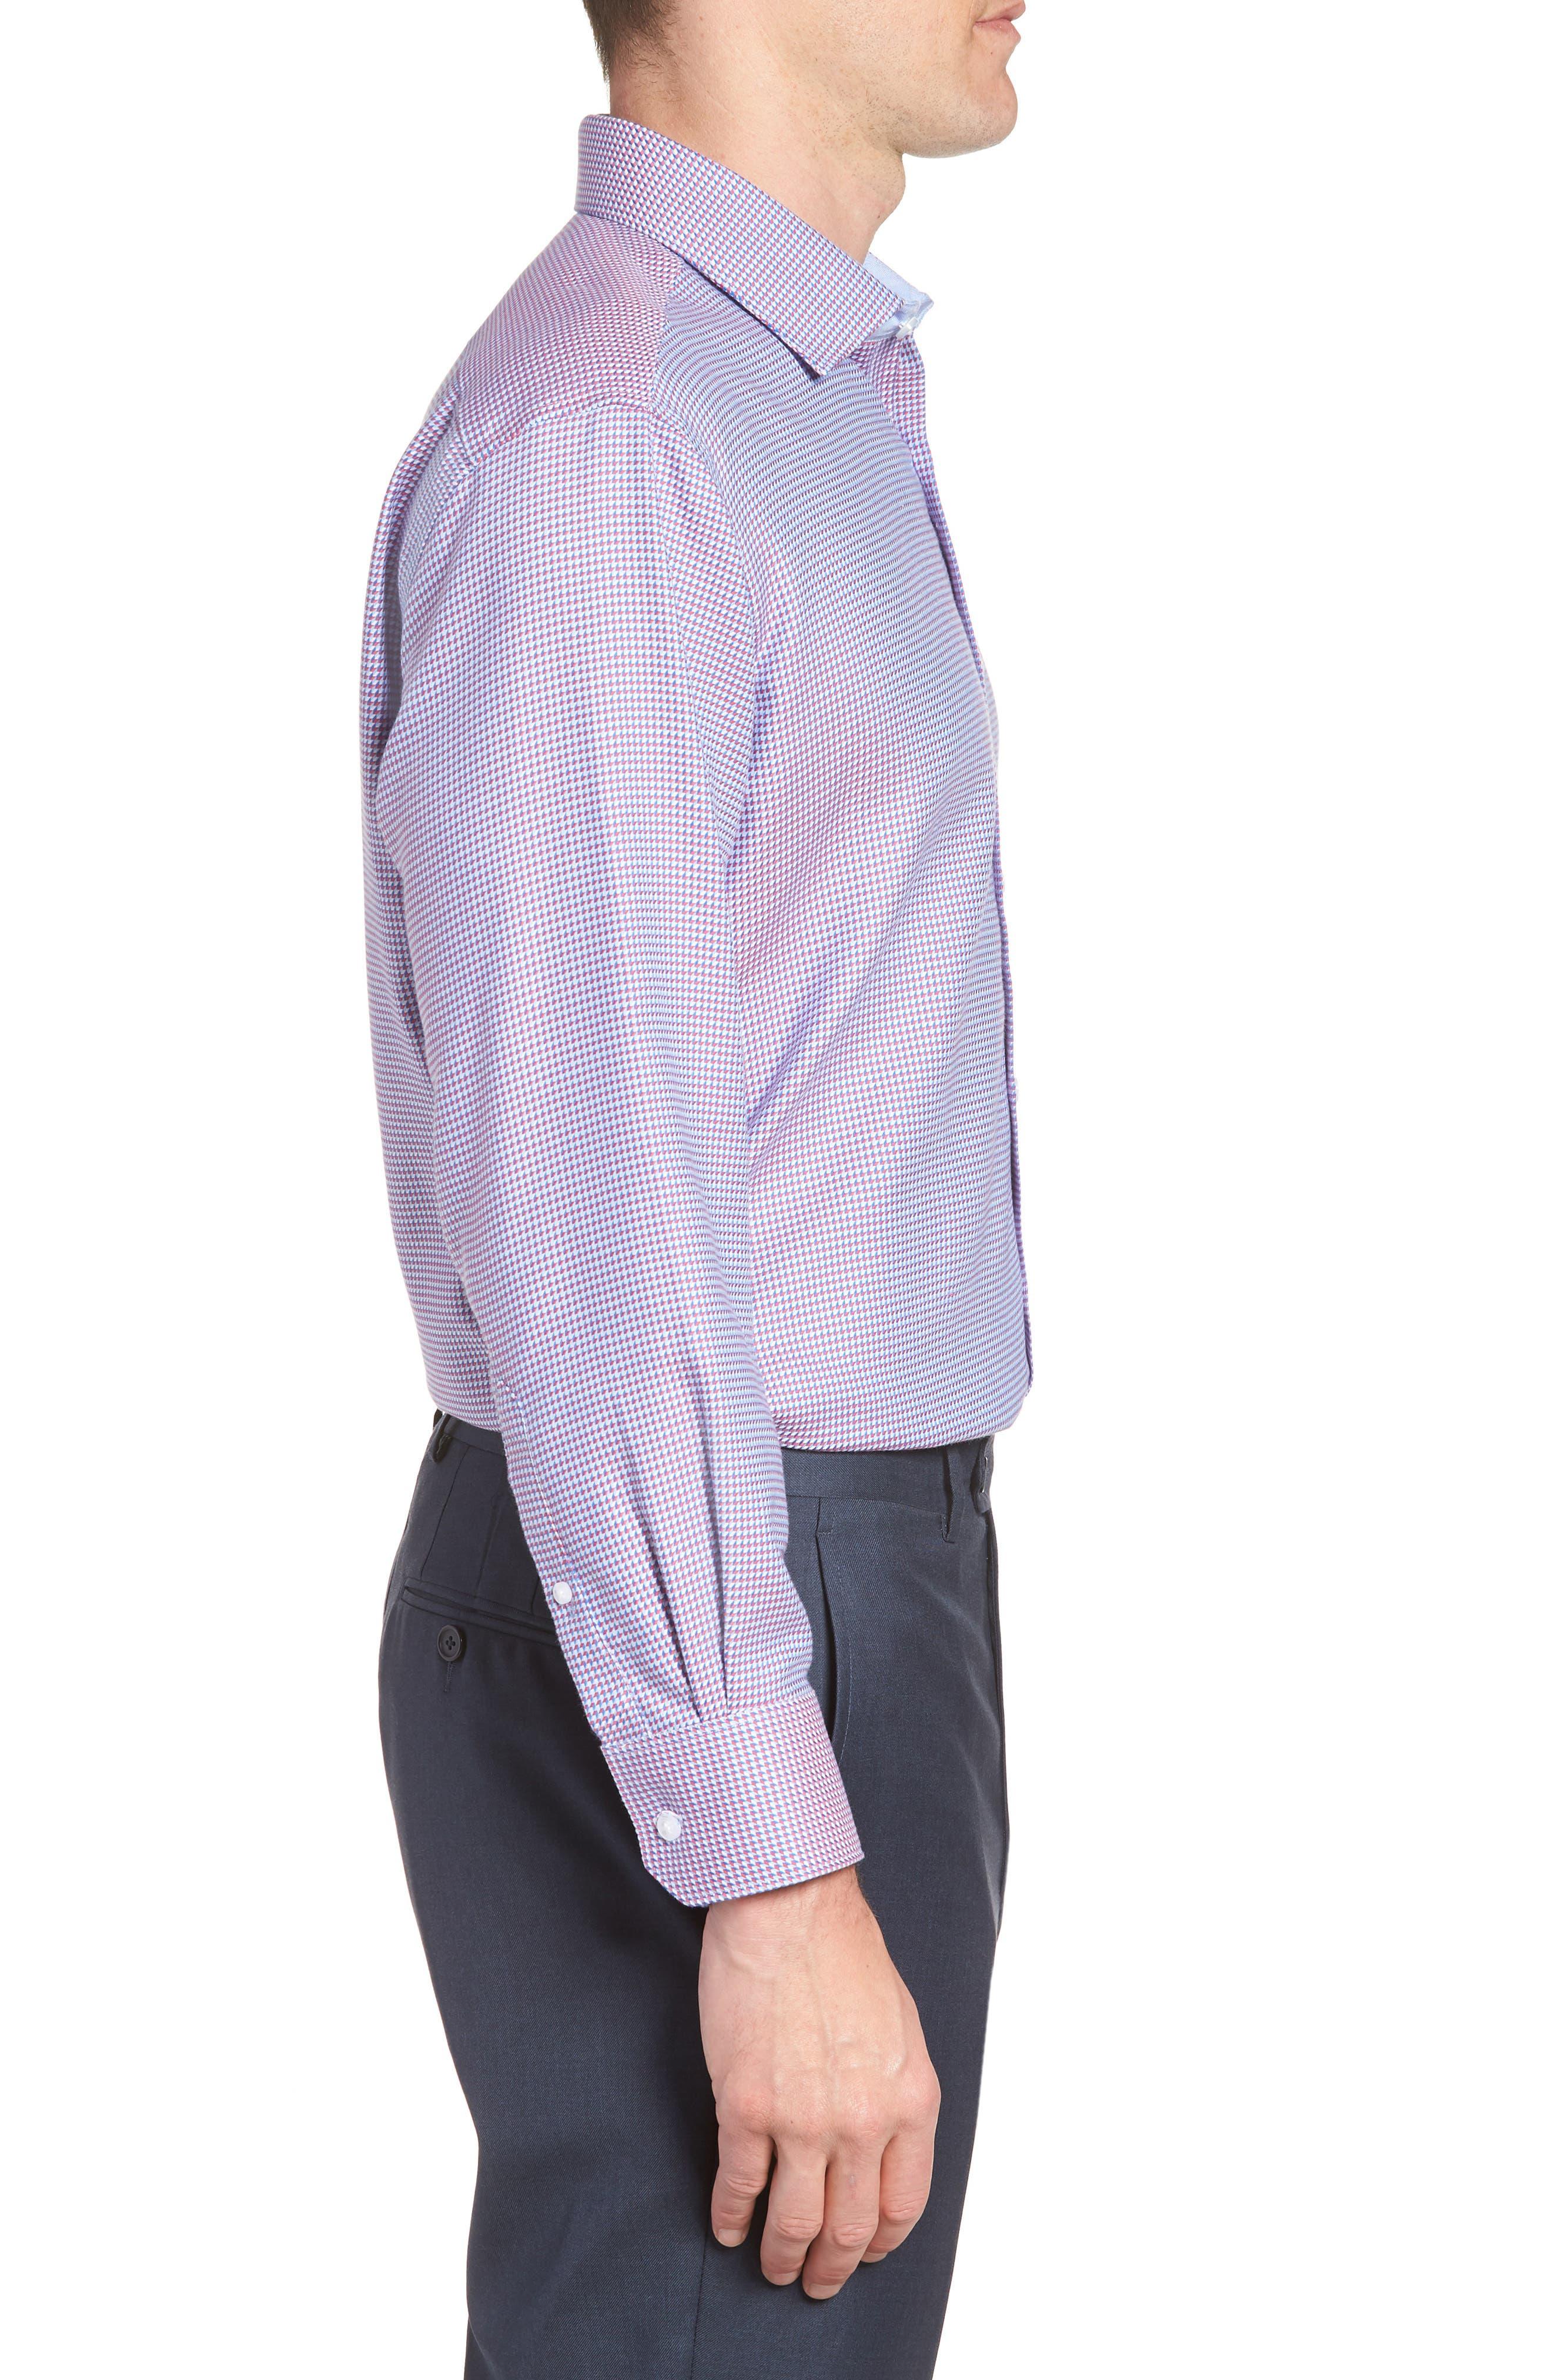 Axton Trim Fit Geometric Dress Shirt,                             Alternate thumbnail 4, color,                             Red/ Blue